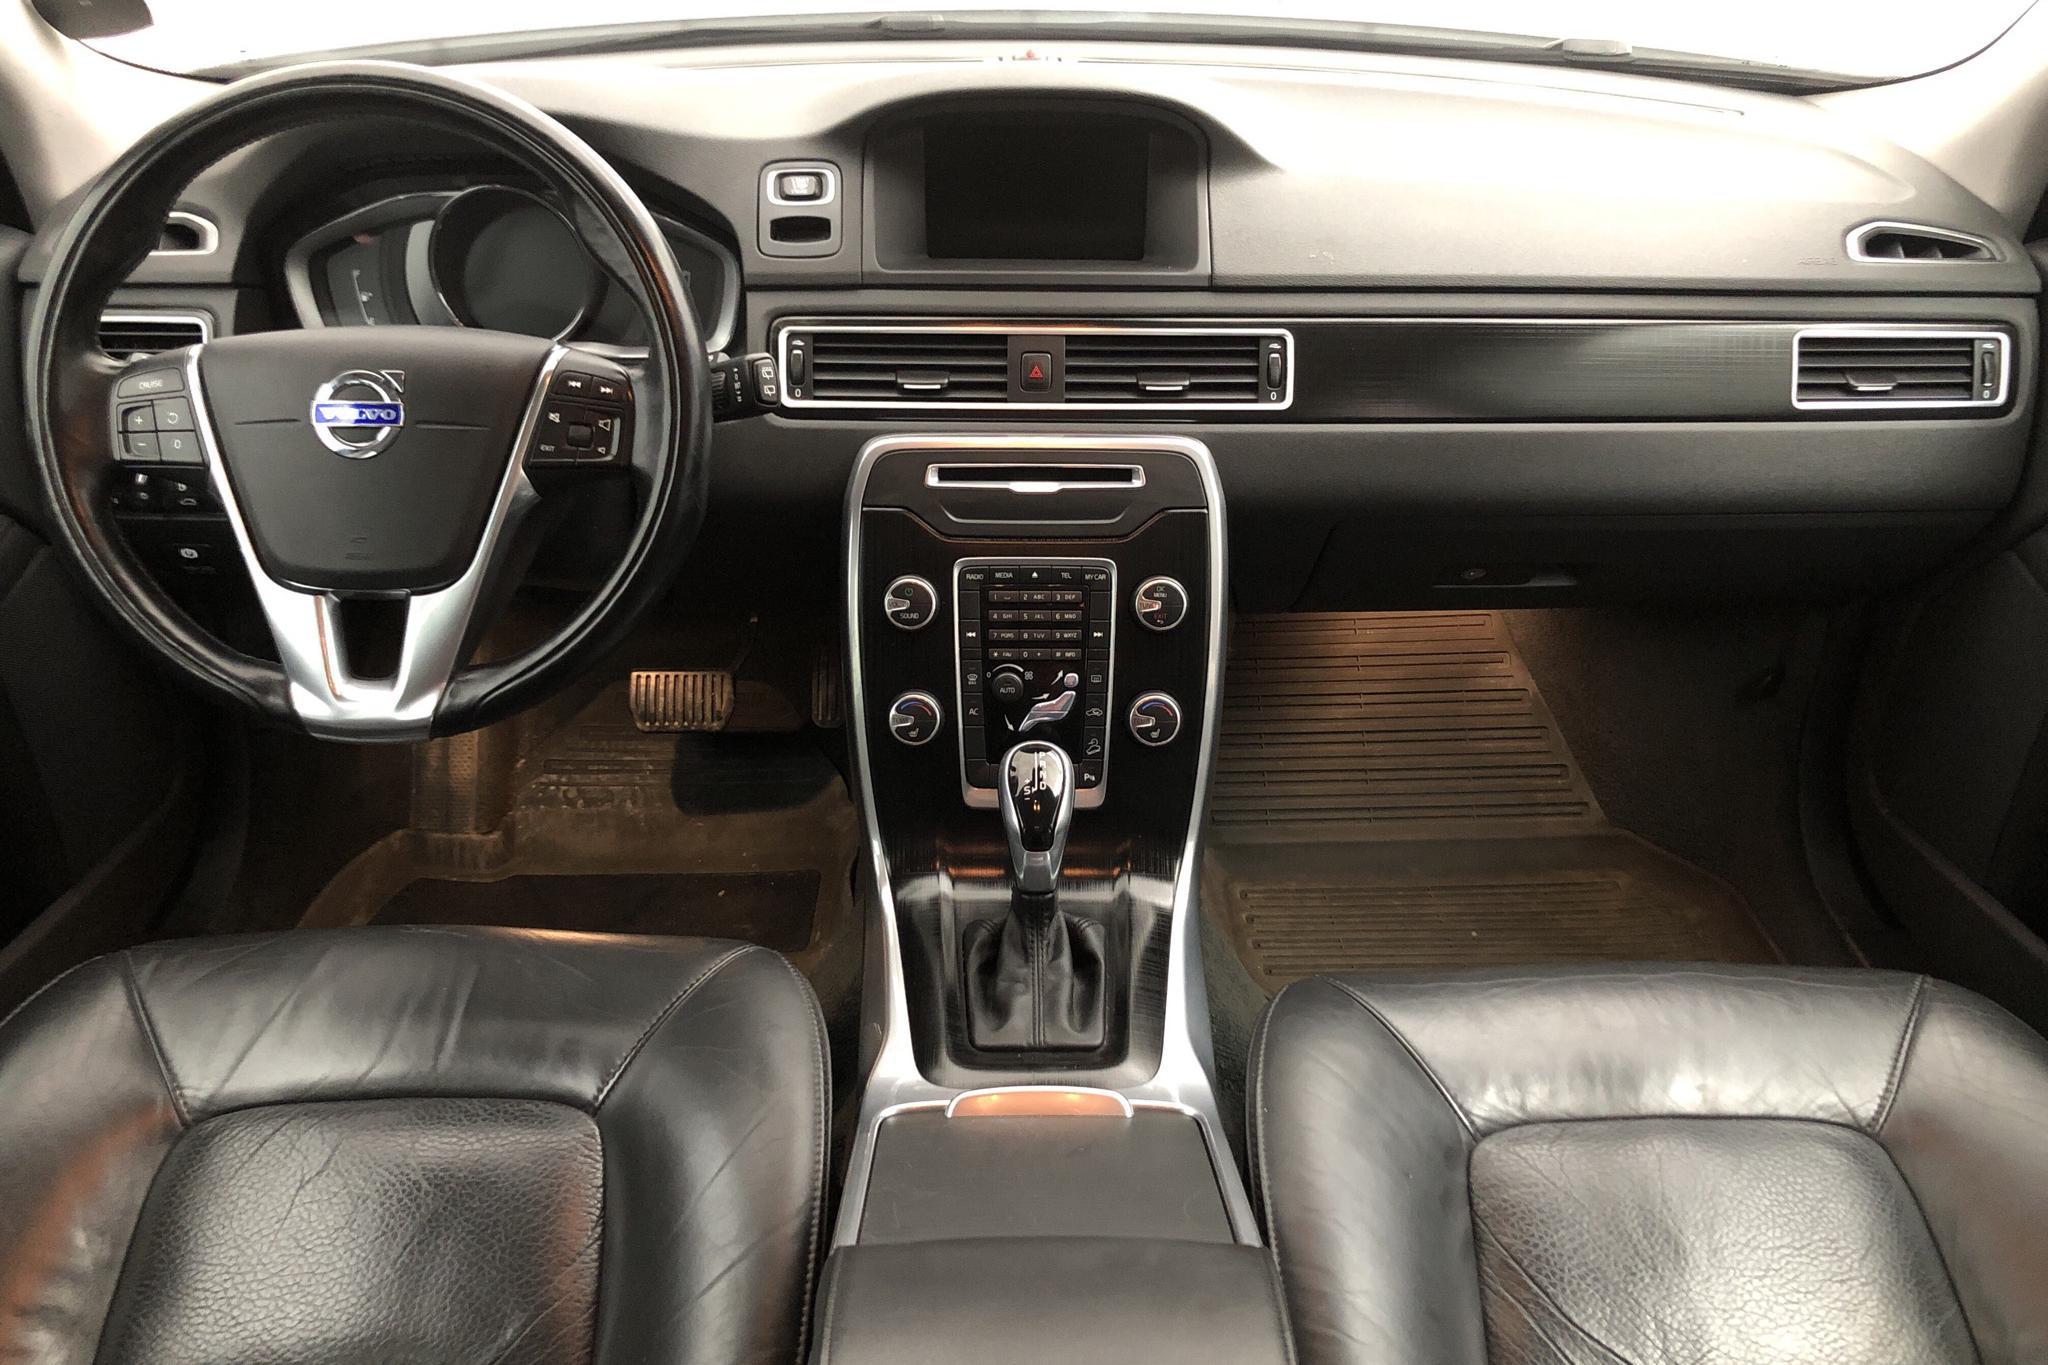 Volvo XC70 II D4 AWD (181hk) - 188 820 km - Automatic - white - 2014